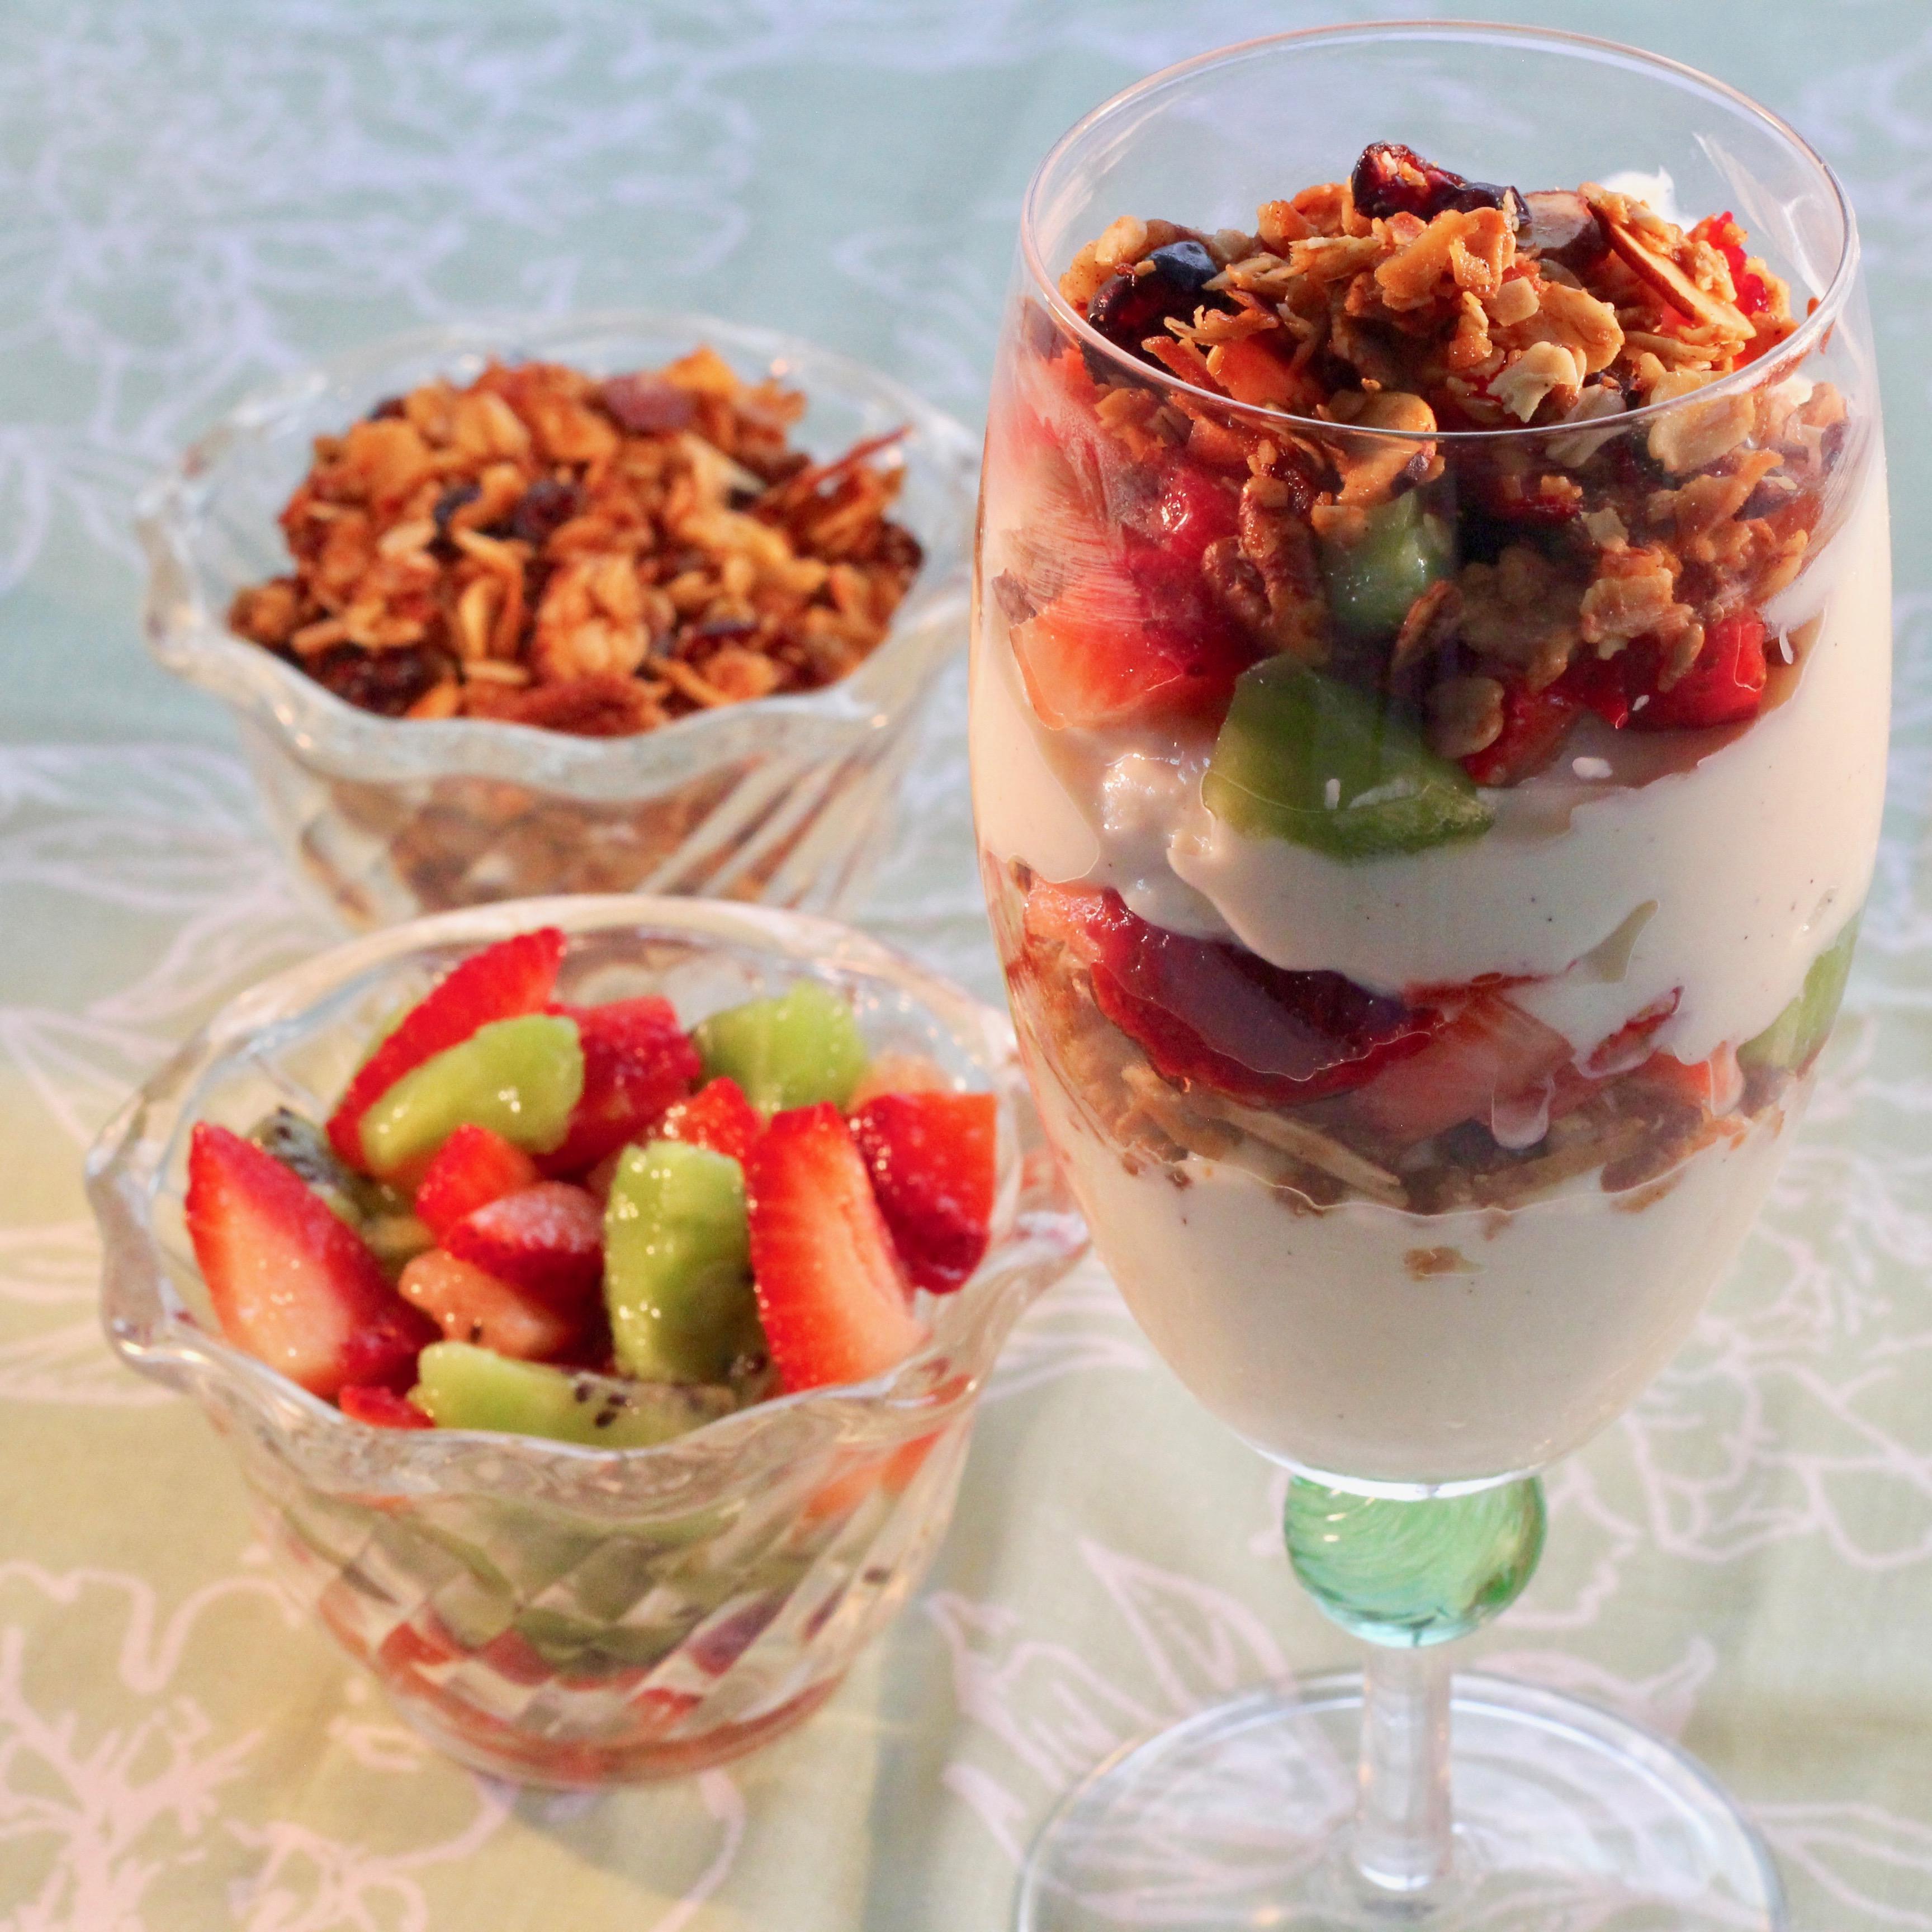 Breakfast Parfait with Granola, Yogurt, and Fruit